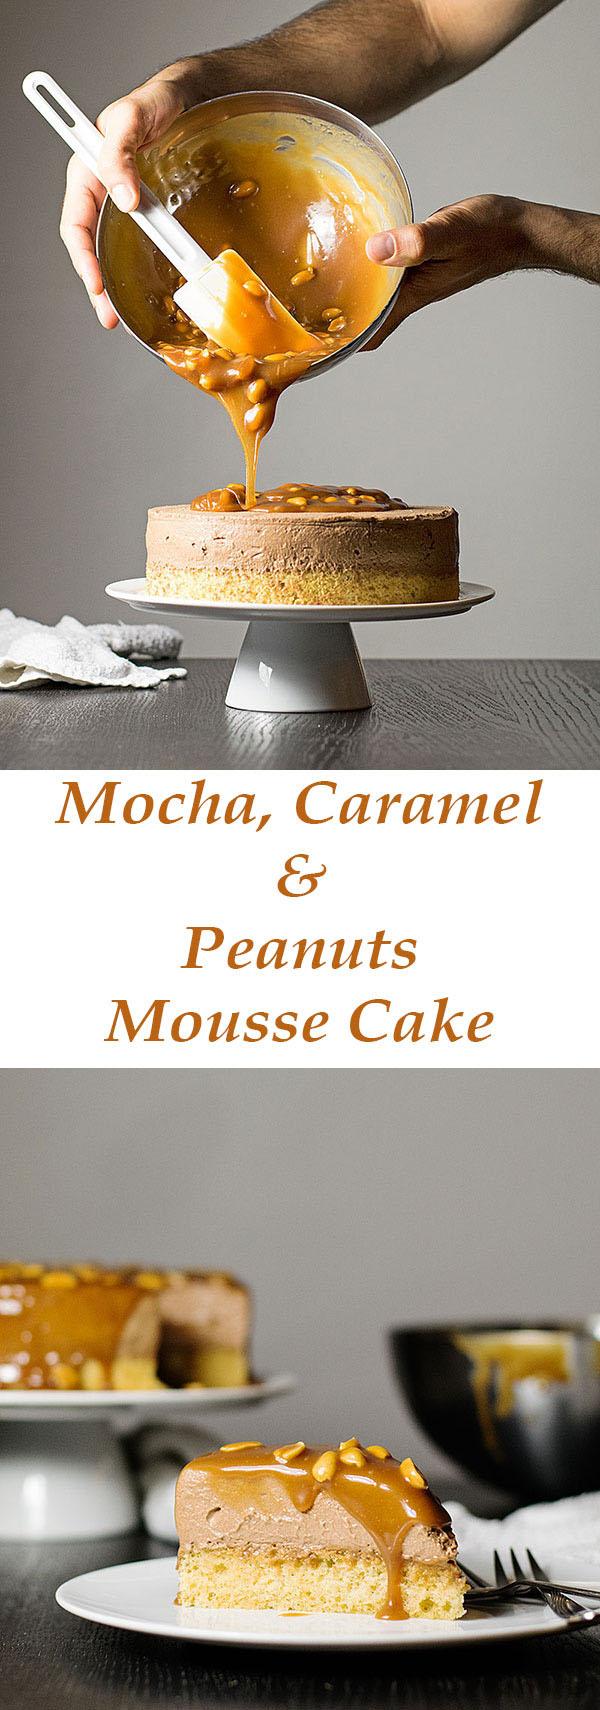 mocha-caramel-and-peanuts-mousse-cake-8